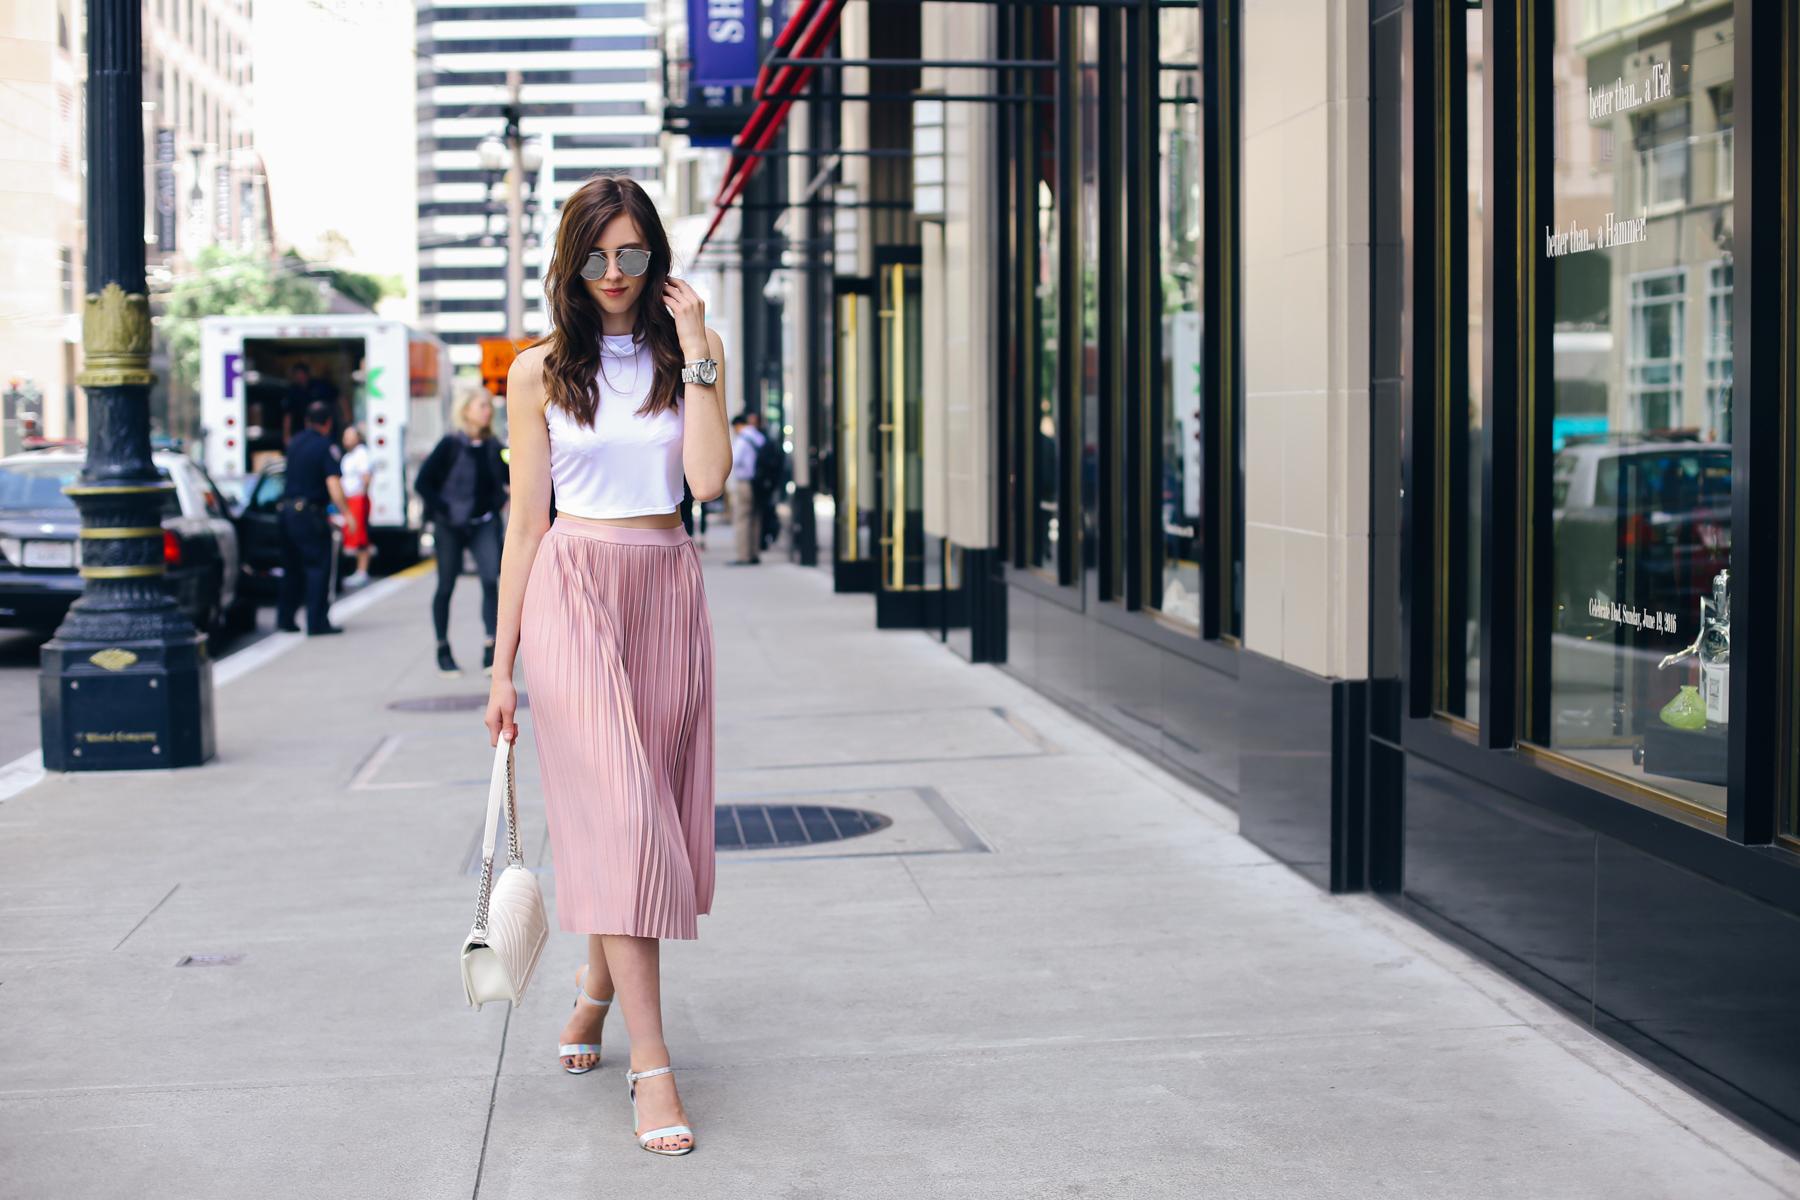 Barbora-Ondracova-FashioninmySoul-Fashion-Blogger-Photography-RyanbyRyanChua-7492